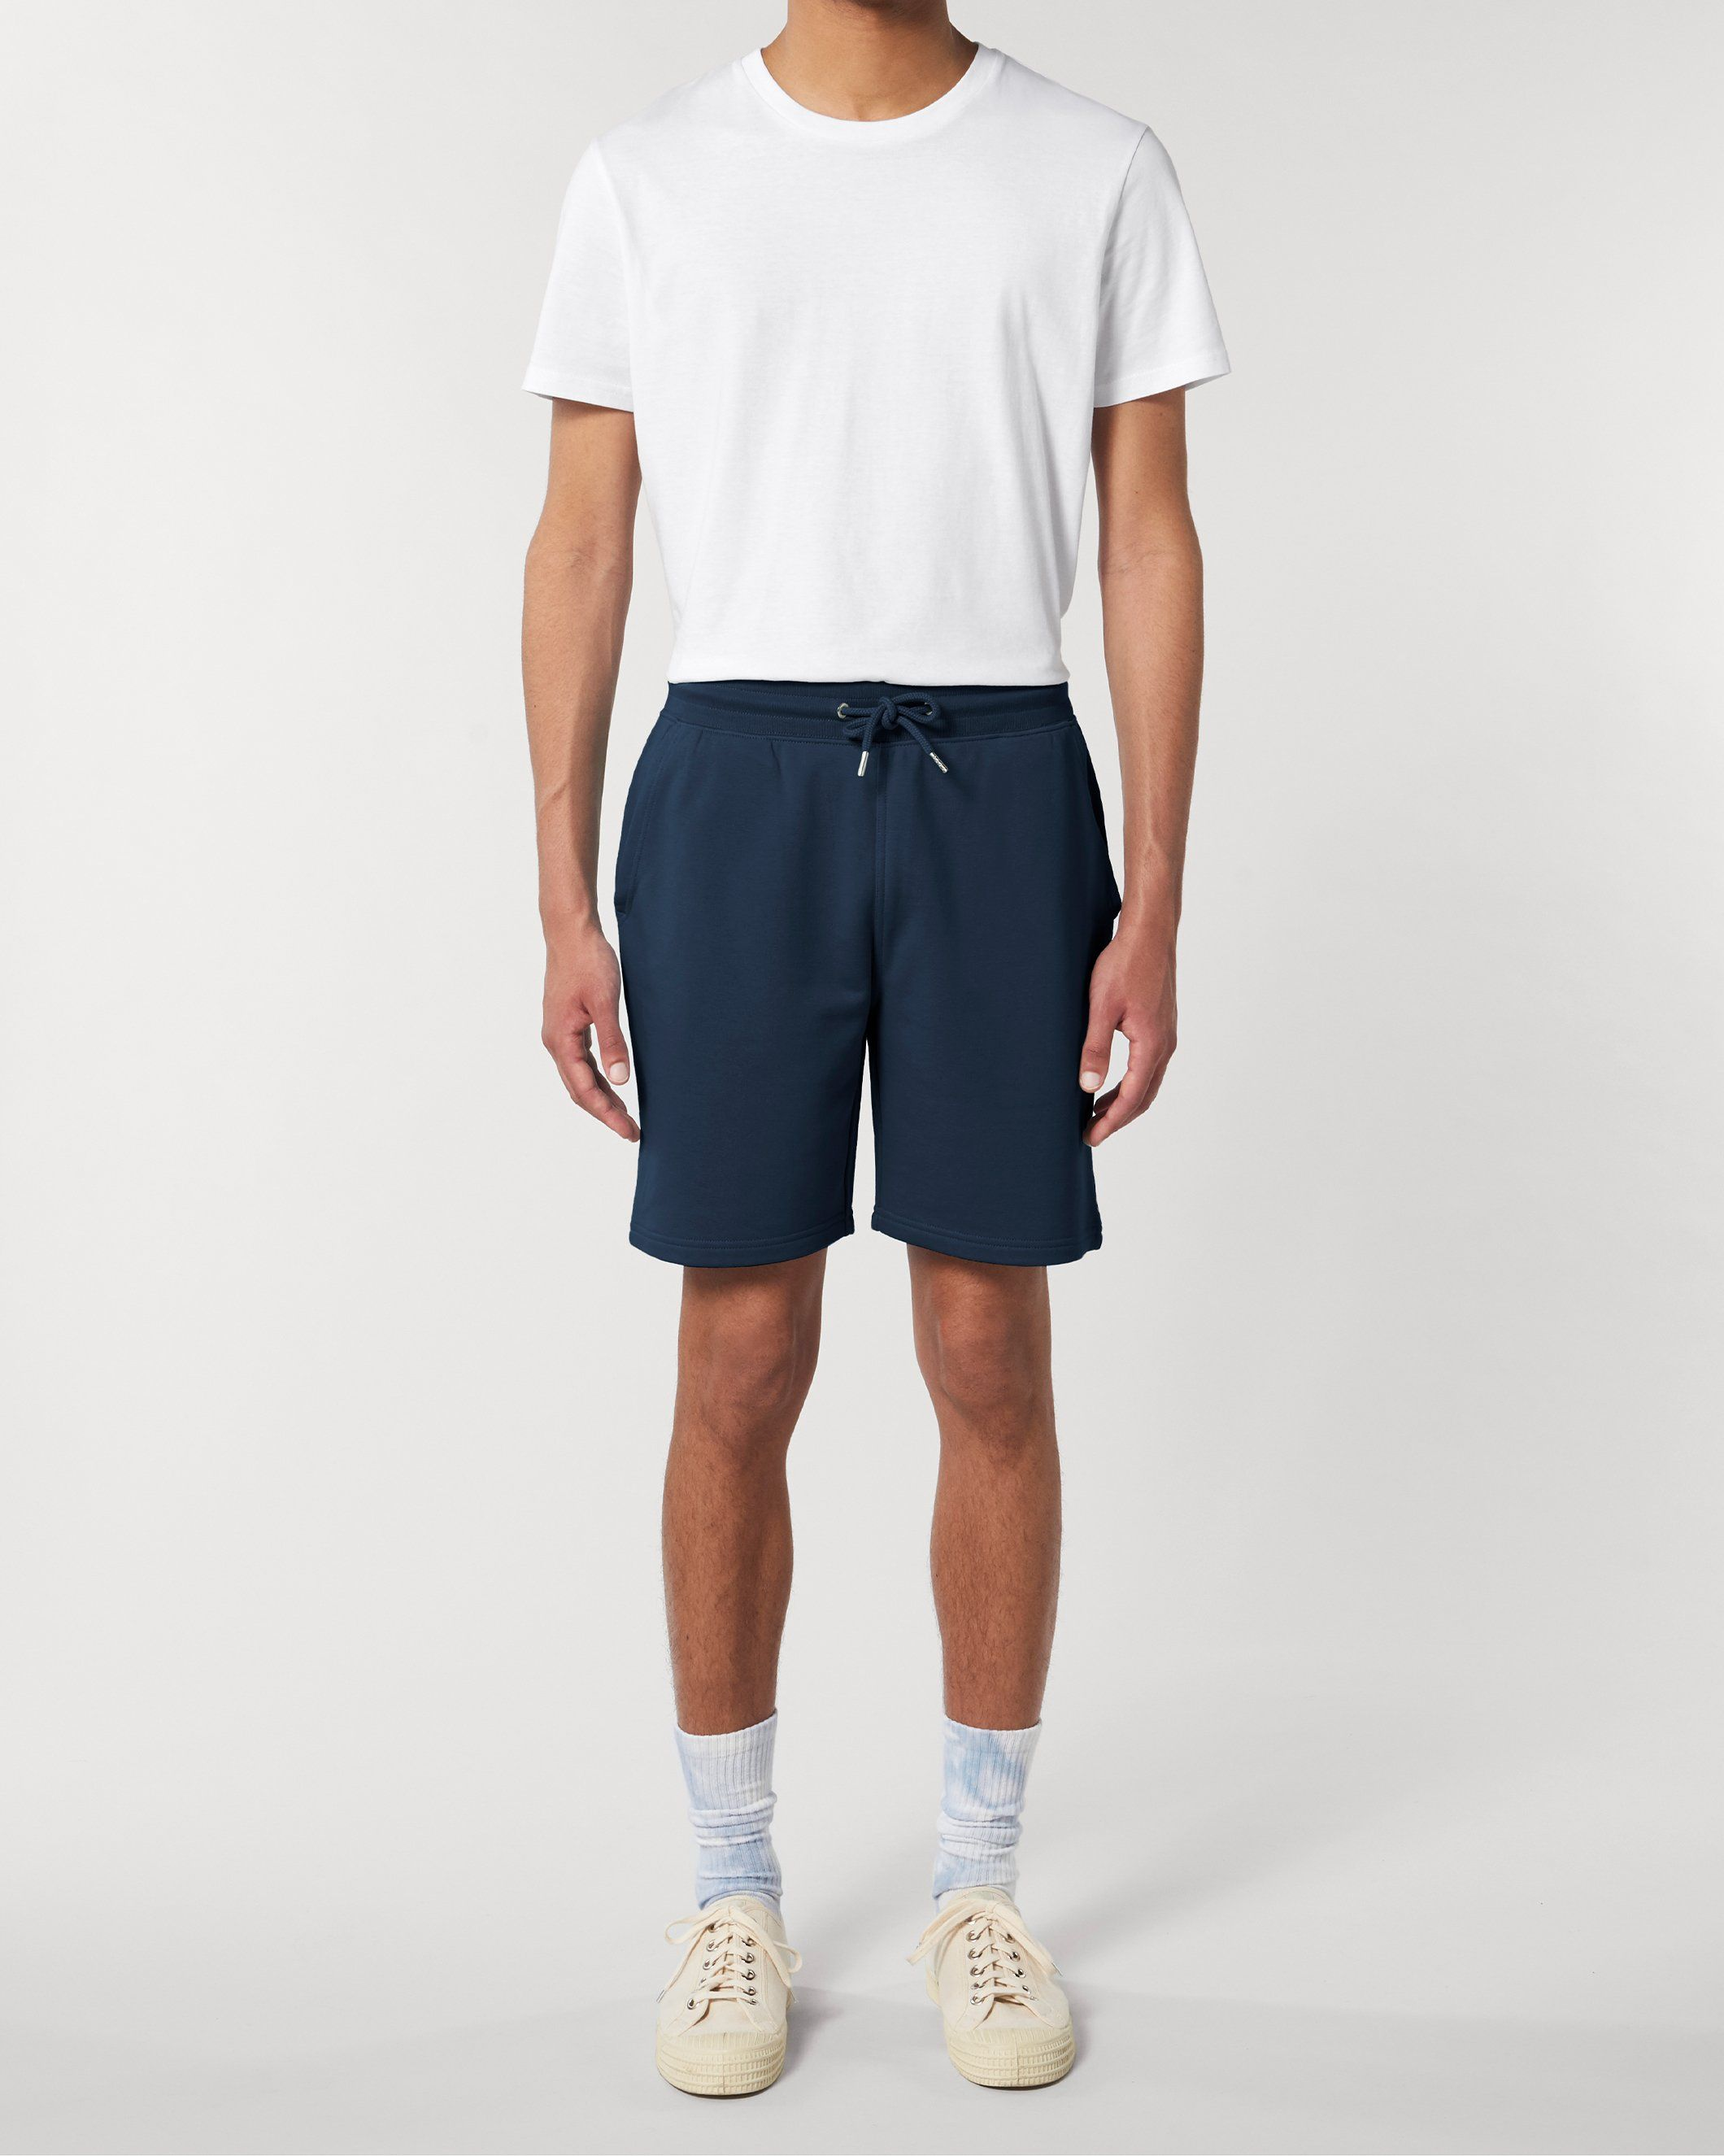 Vayu Unisex Jogger Shorts in Navy